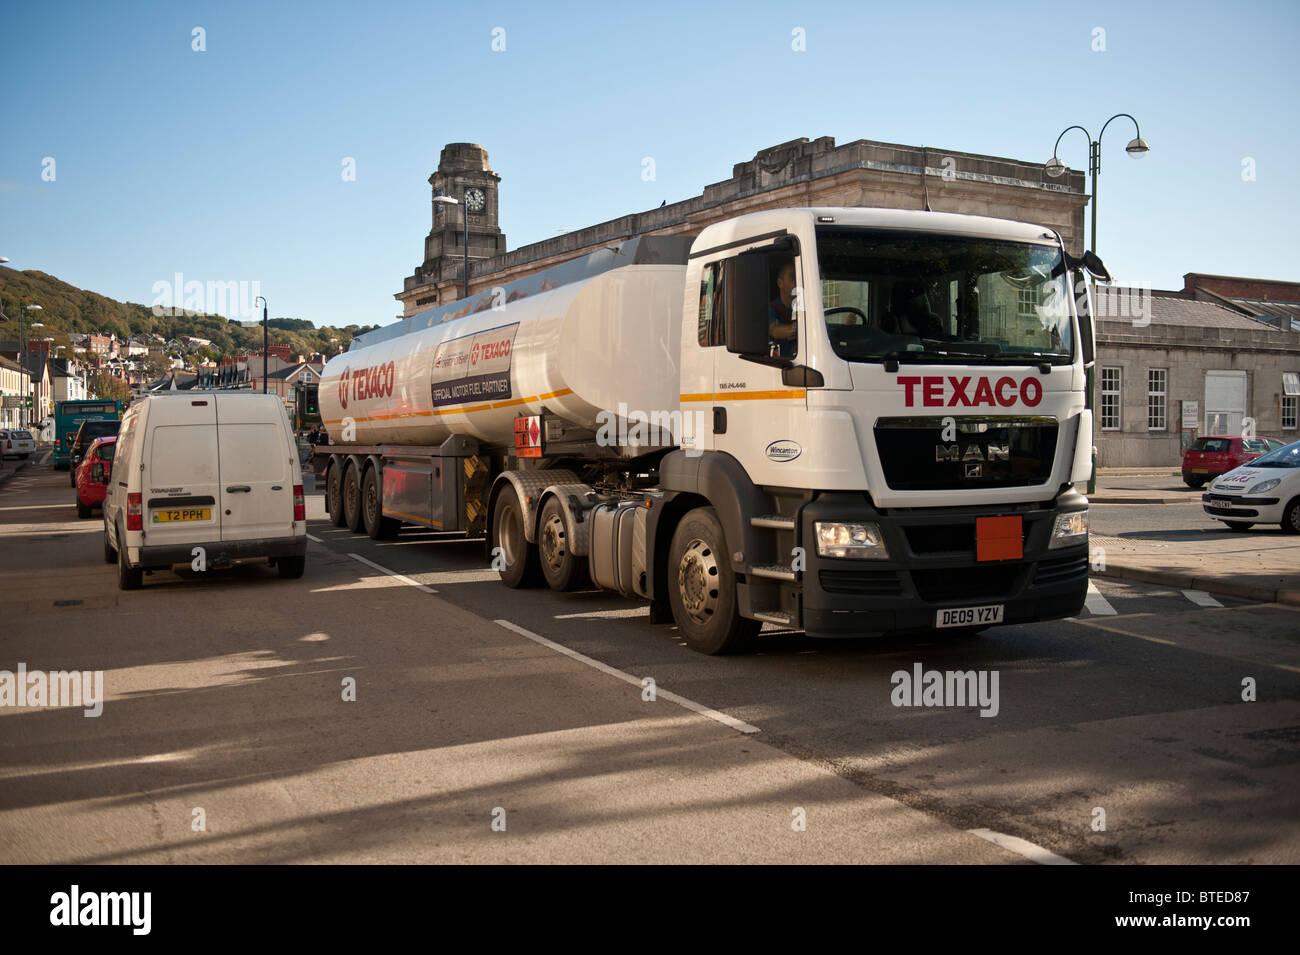 texaco petrol tanker, UK - Stock Image